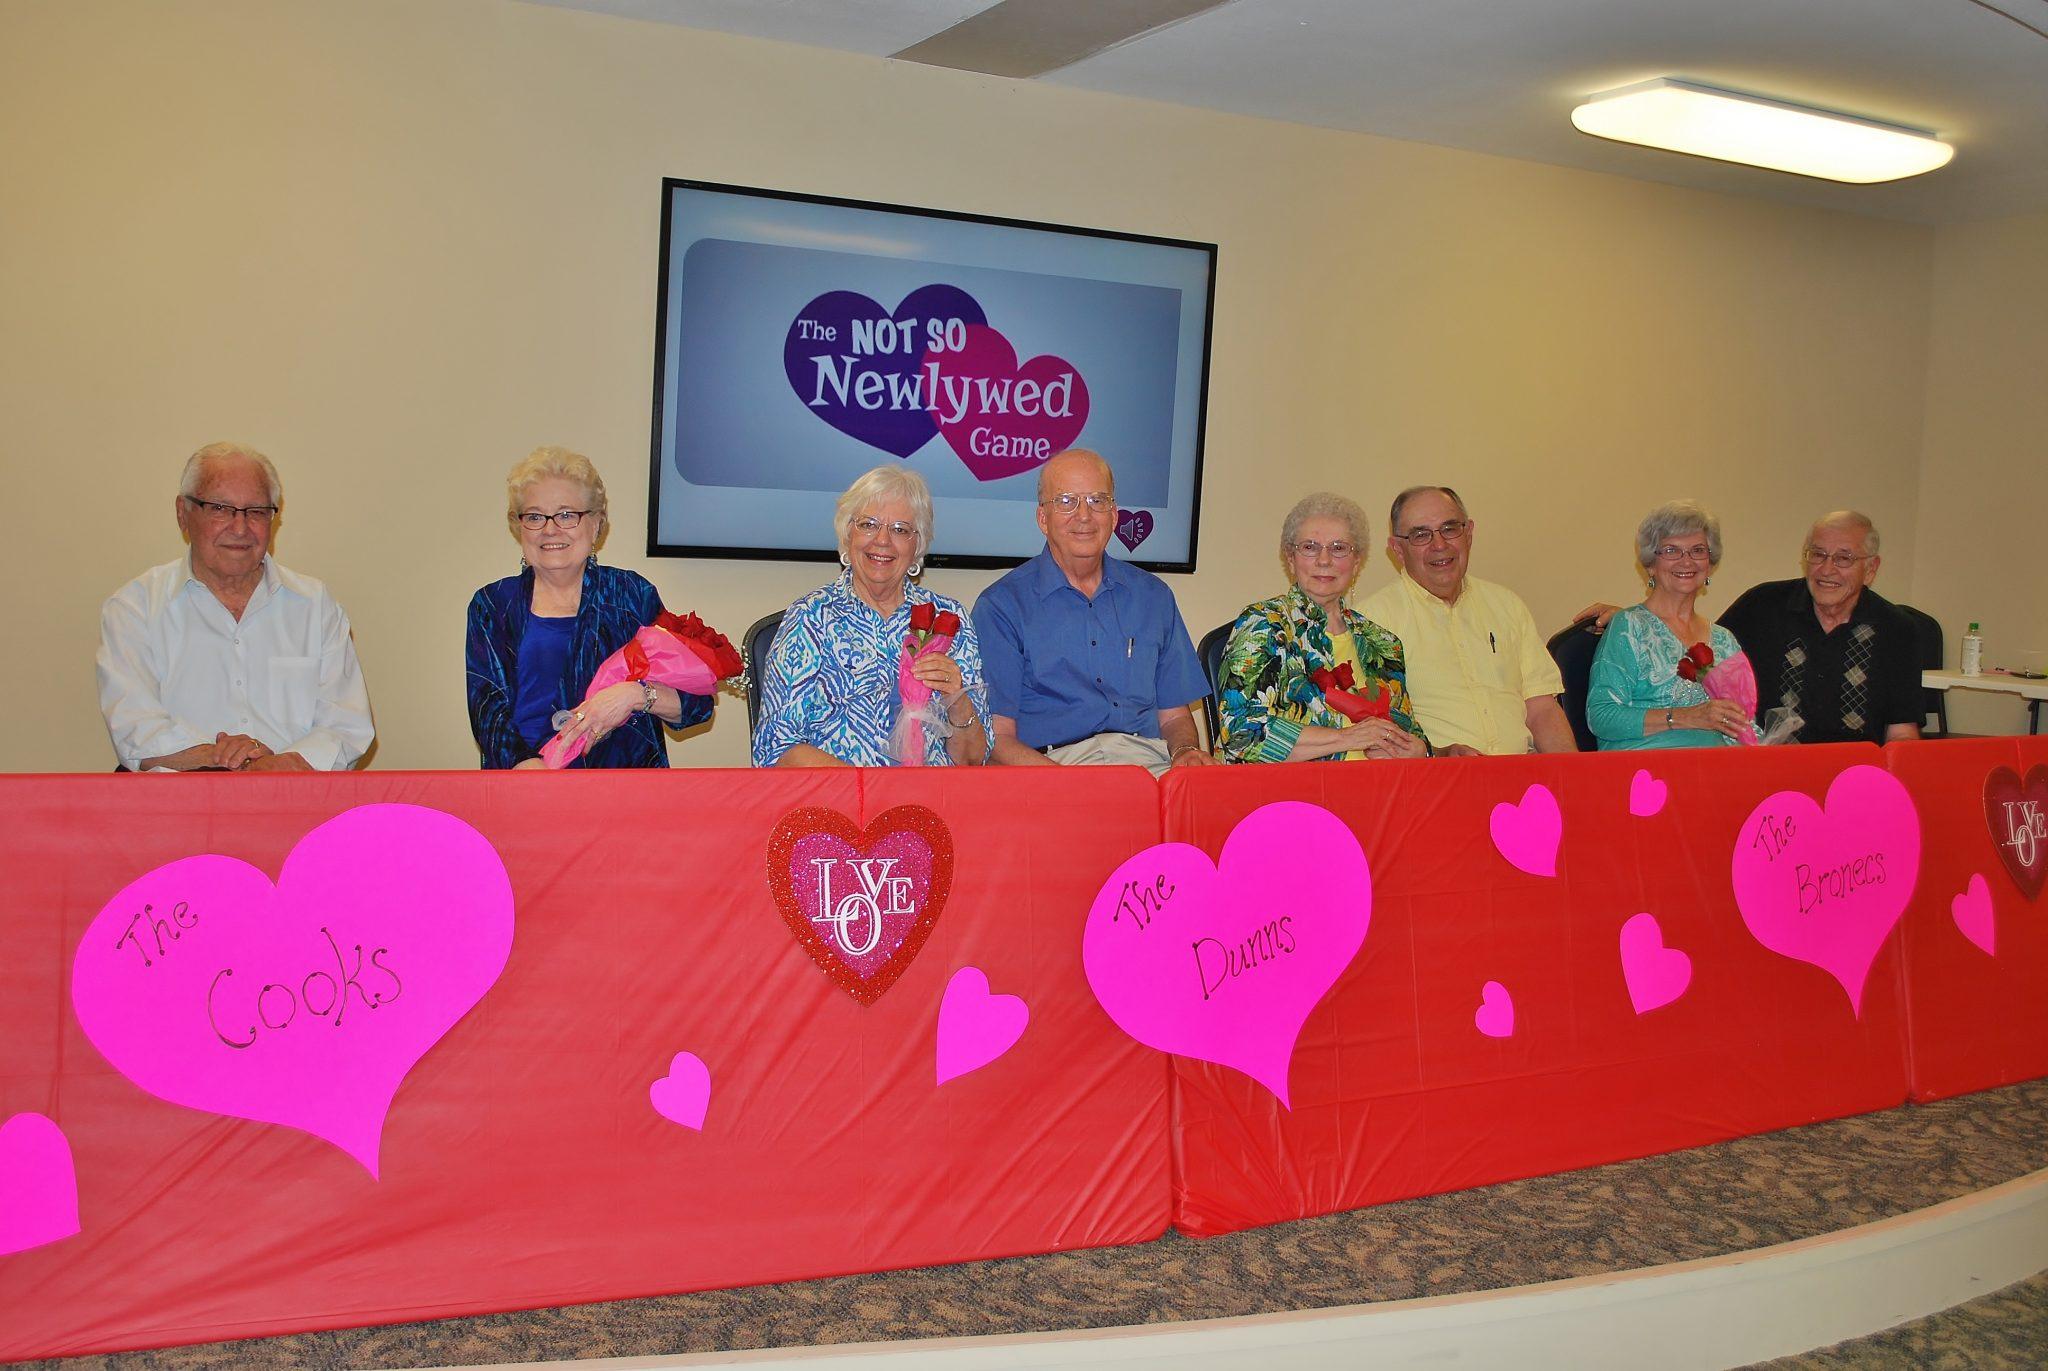 Briarcliff Photo Gallery Events Mccrite Plaza Senior Living